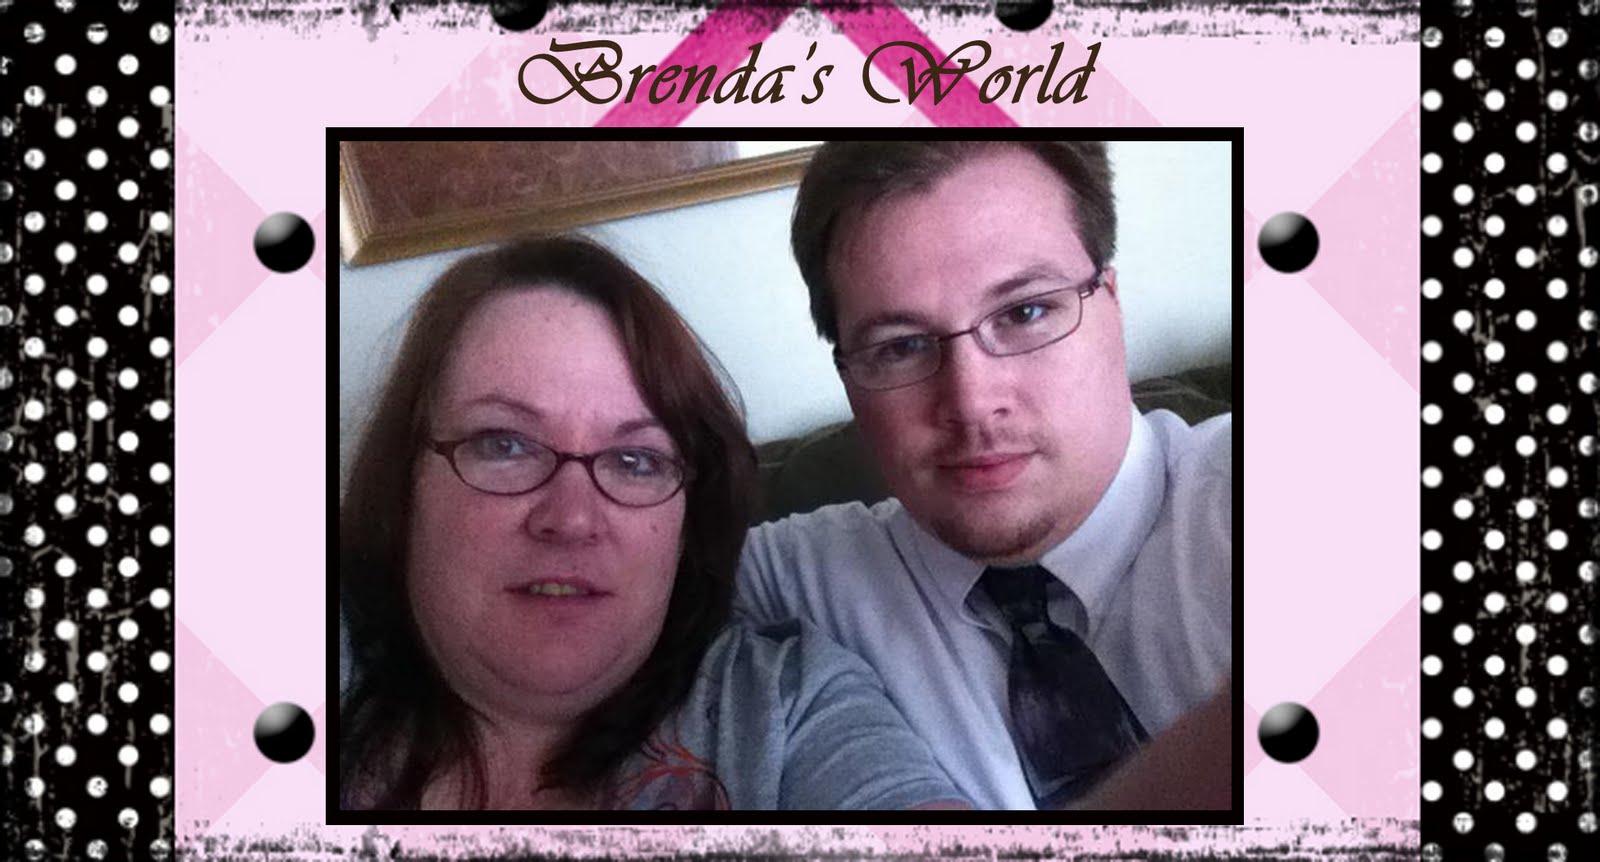 Brenda's World